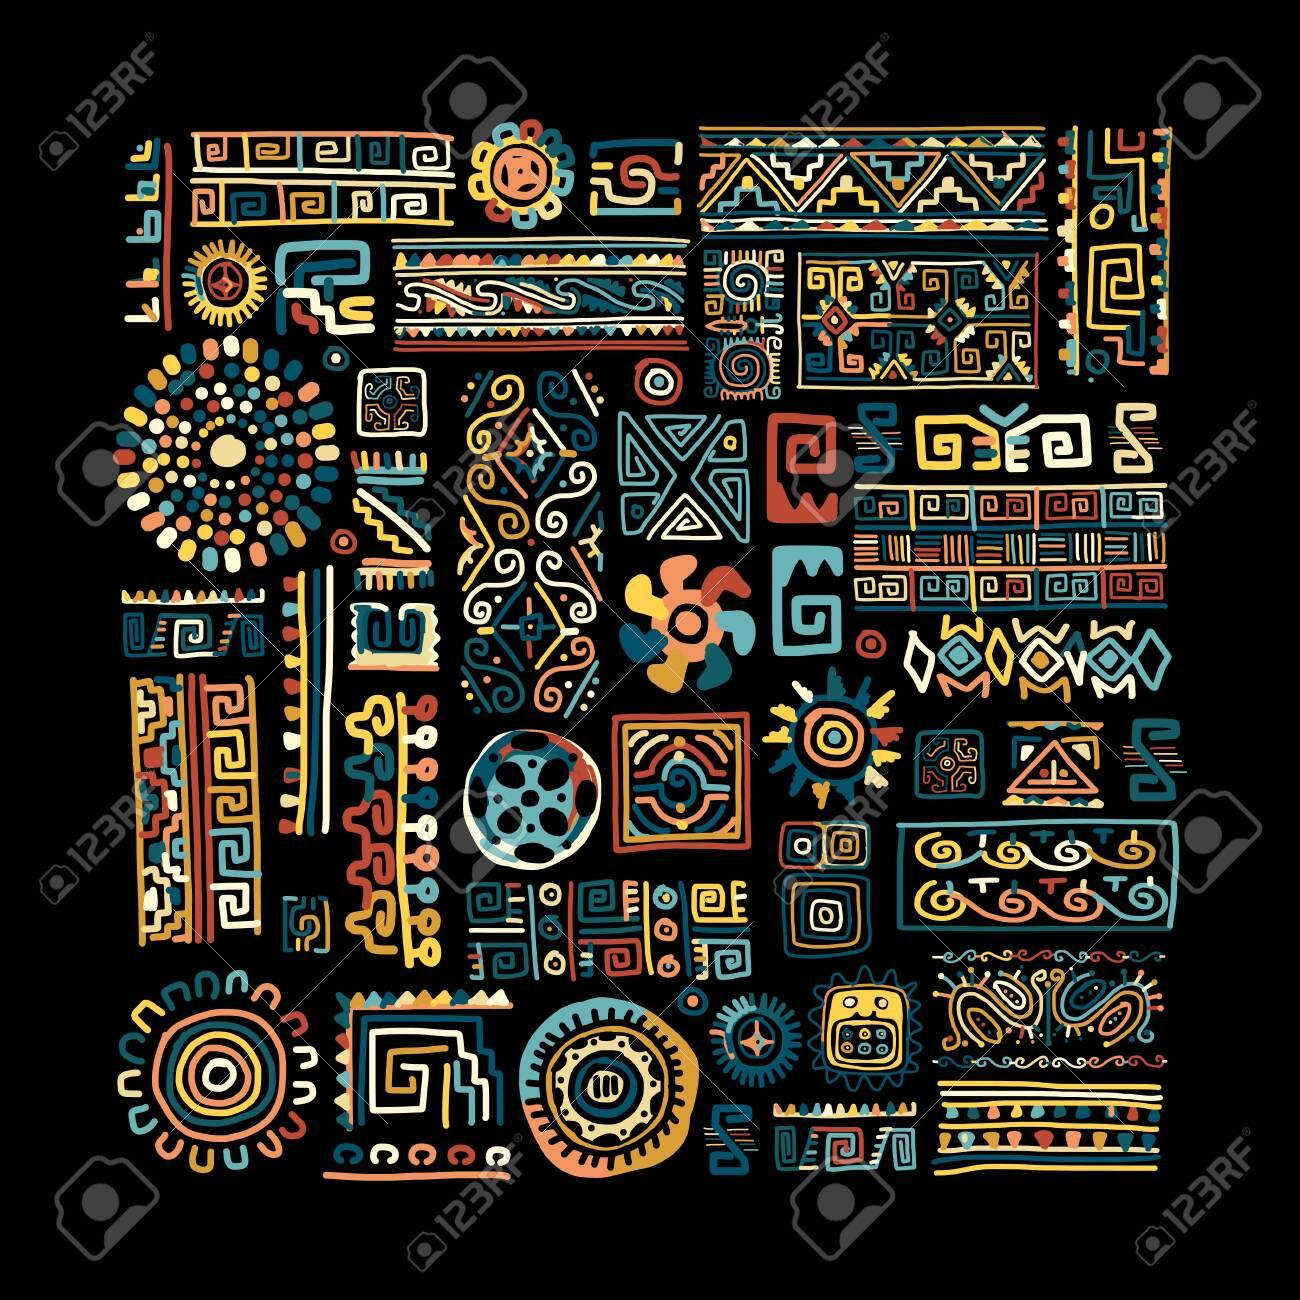 Ethnic handmade ornament for your design - 138636695